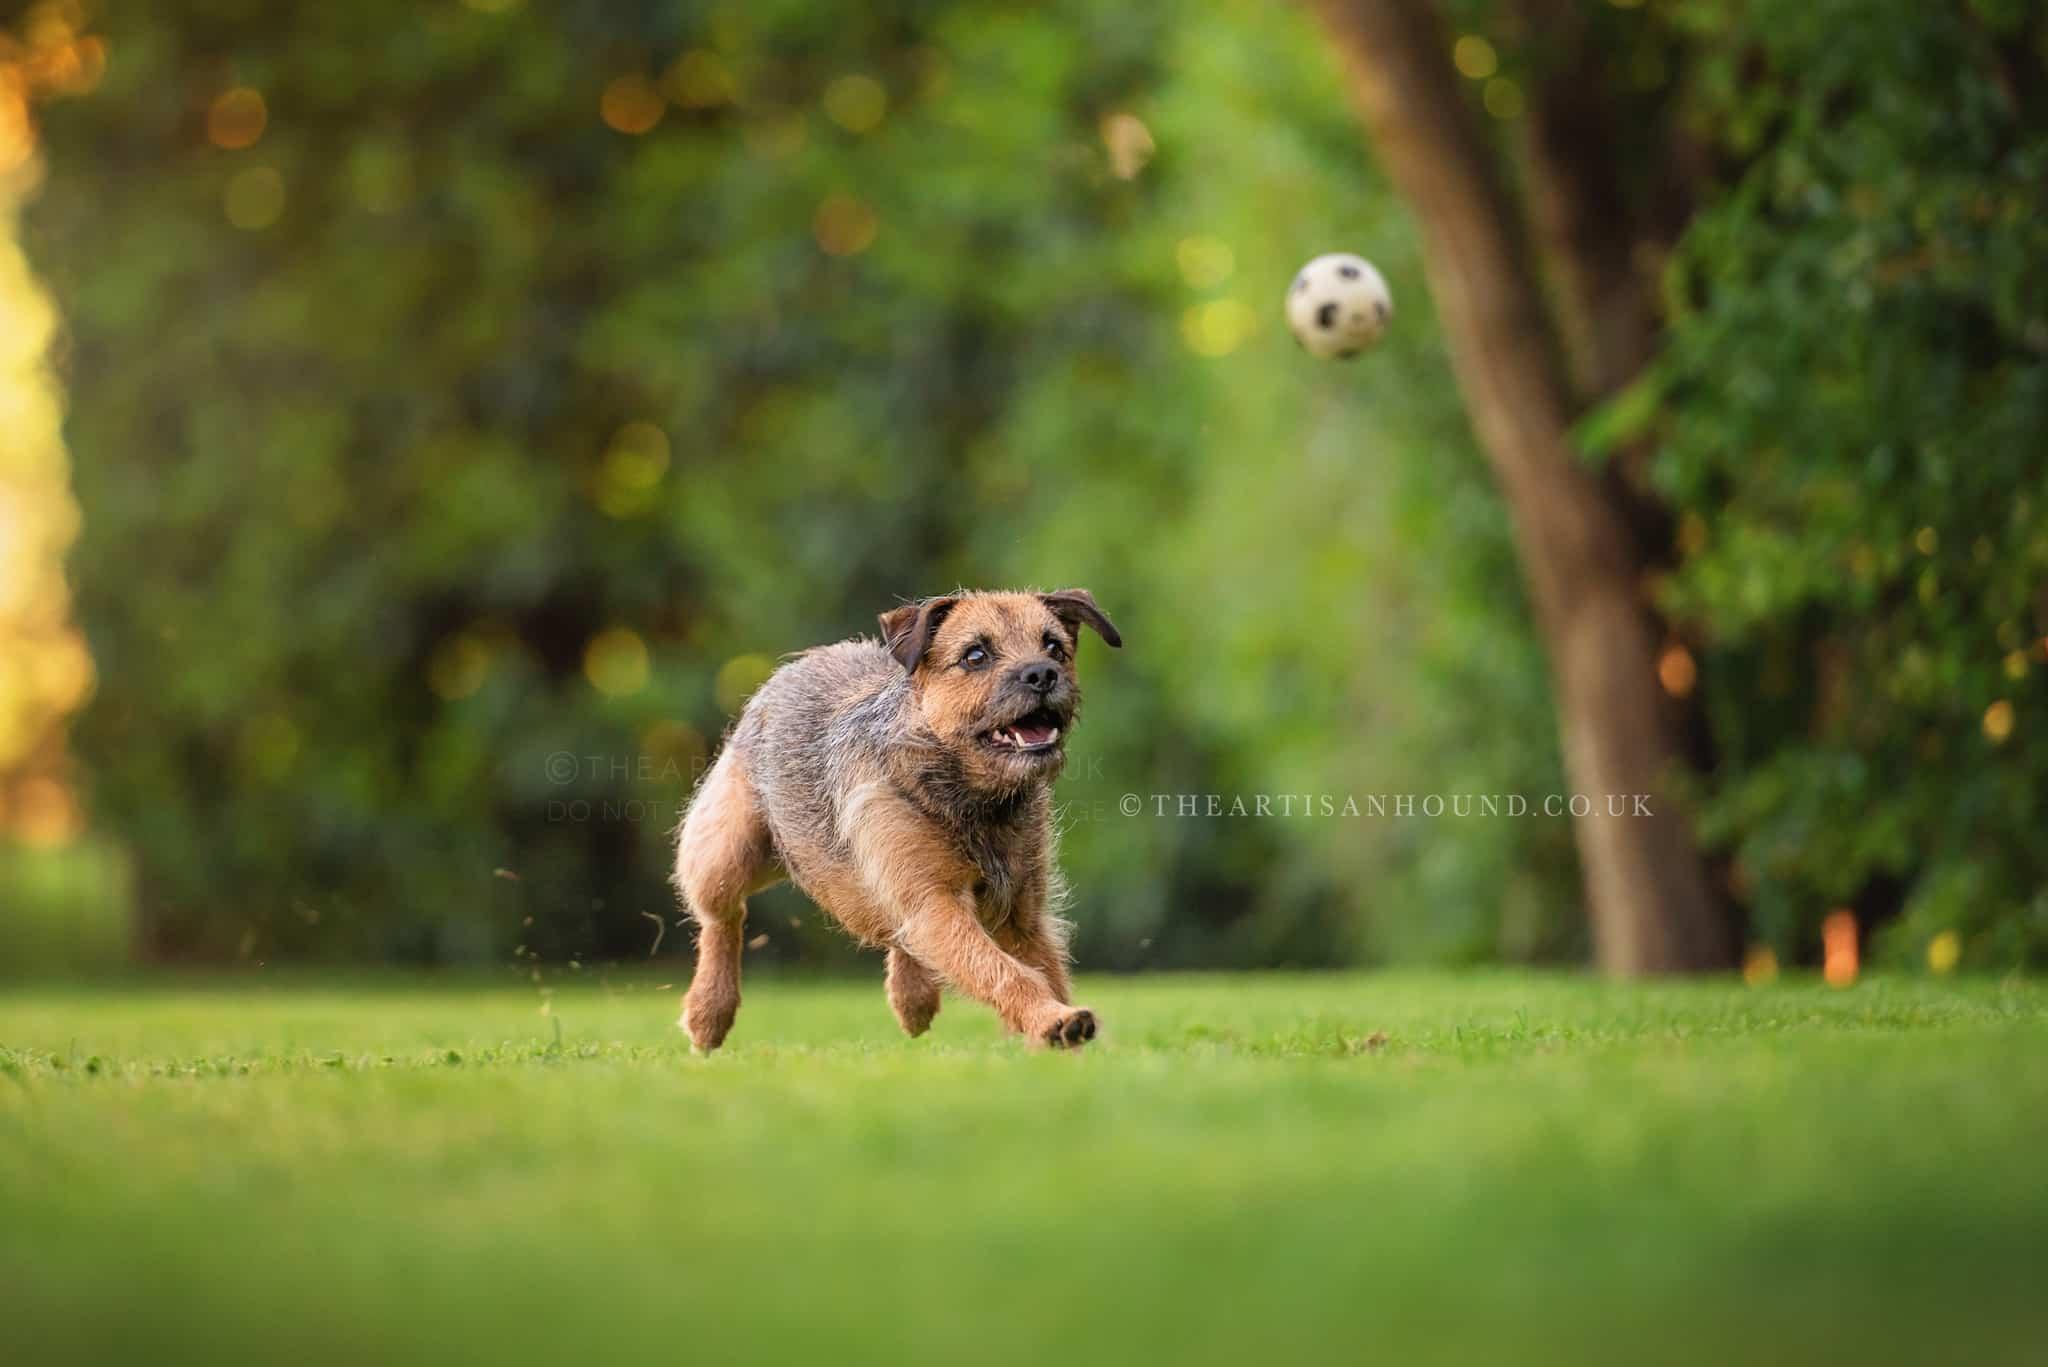 dog-chasing-ball-in-garden